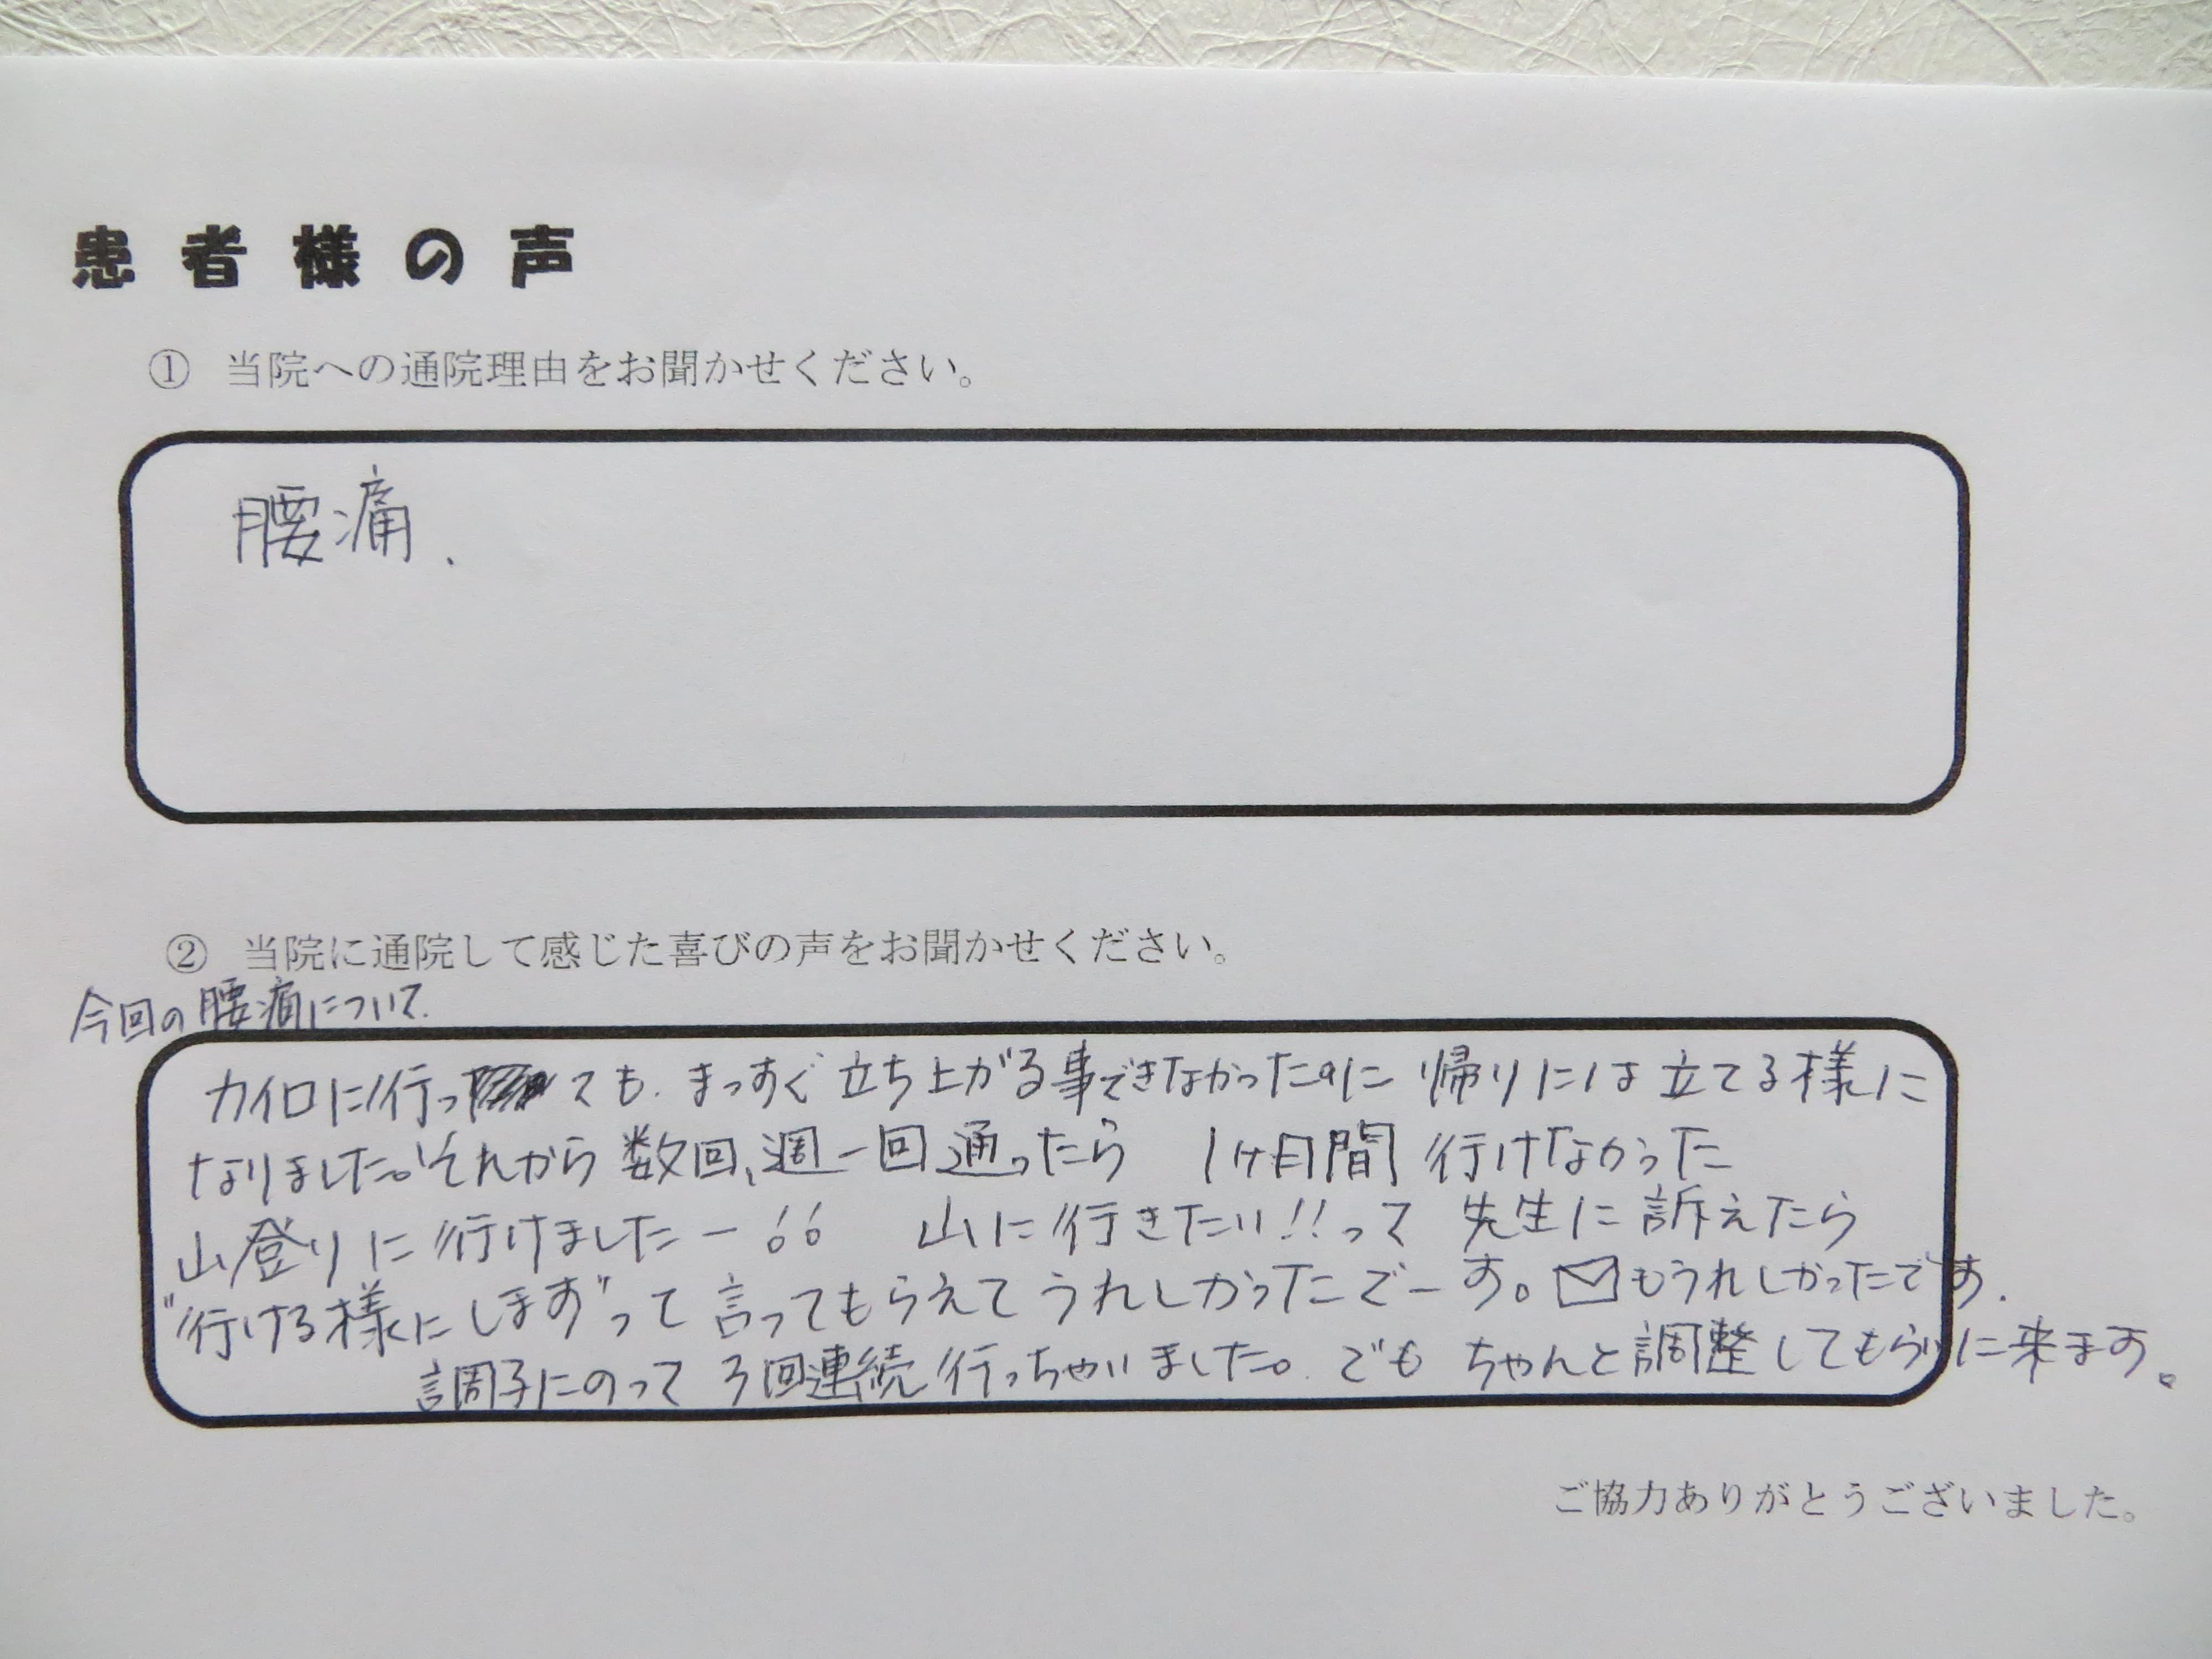 IMG_0369_1.JPG